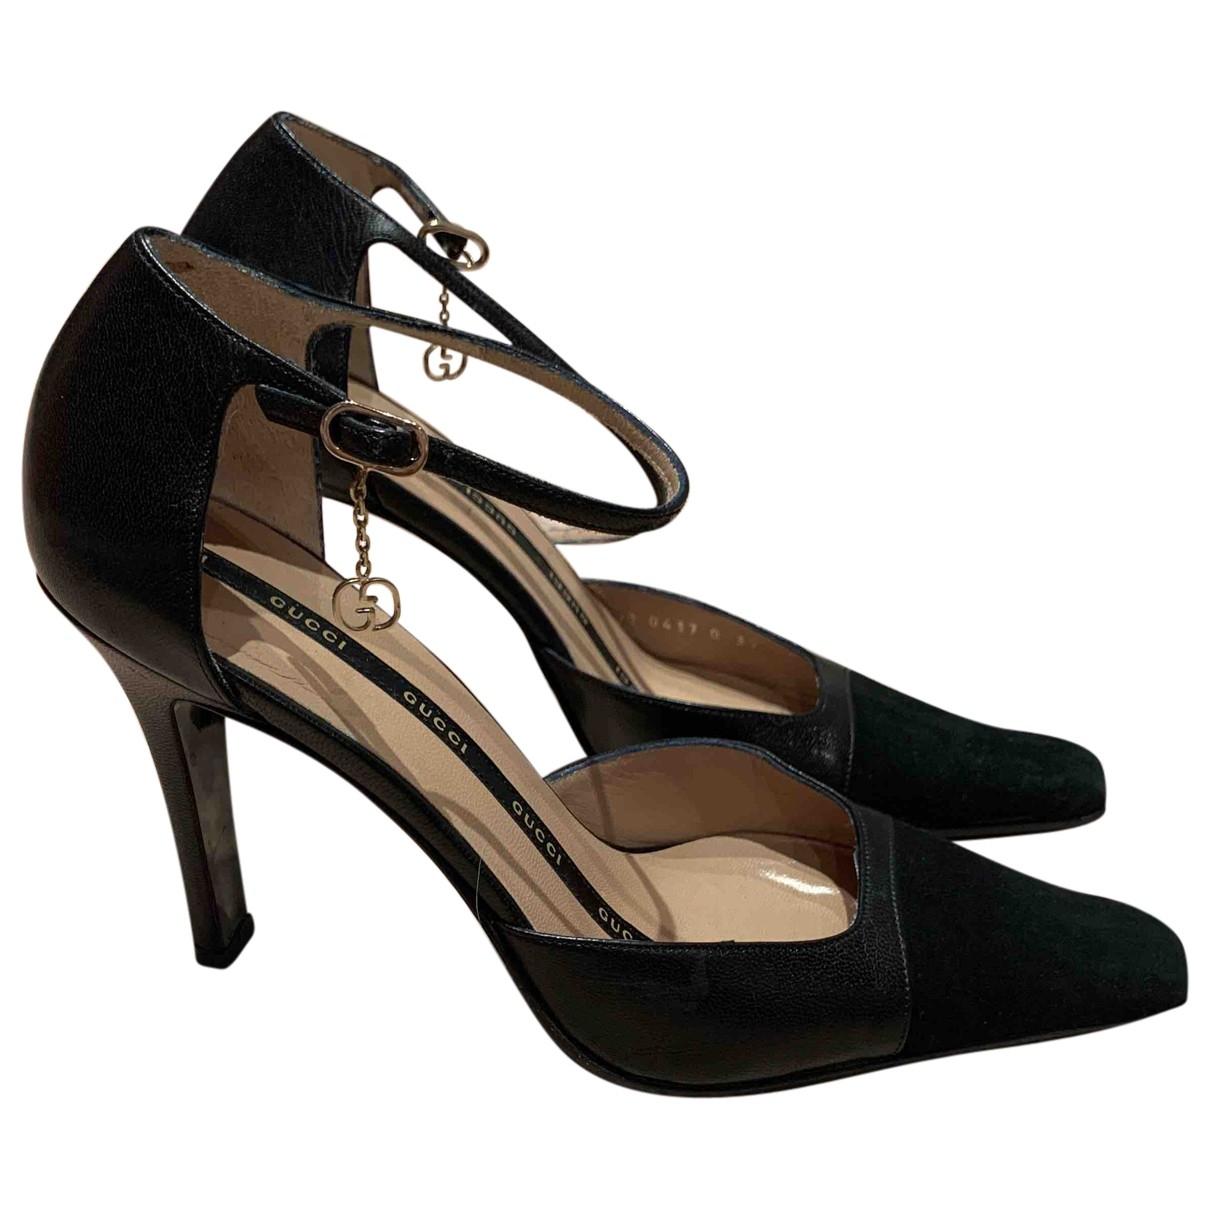 Gucci \N Black Leather Heels for Women 37 EU